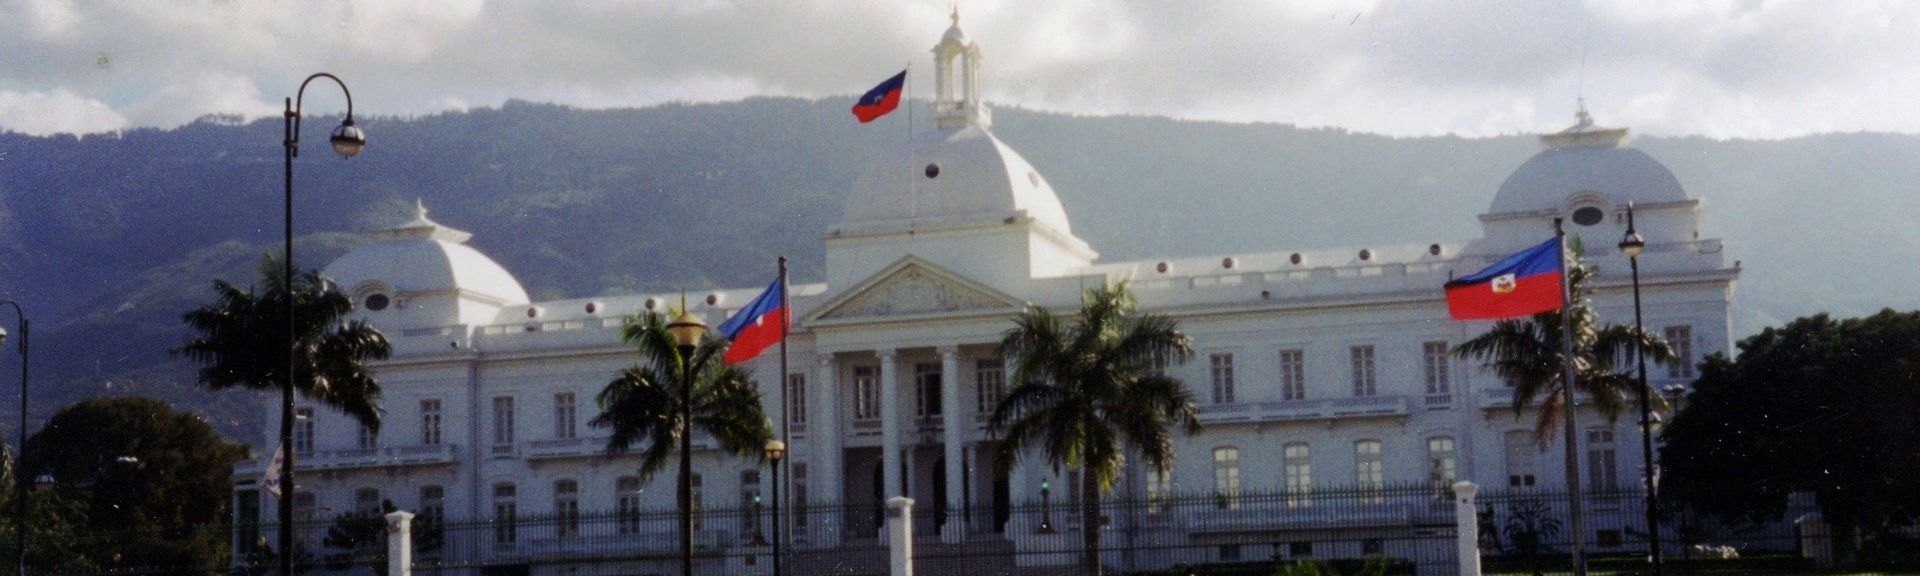 Port-au-Prince, Departament Zachodni, Haiti